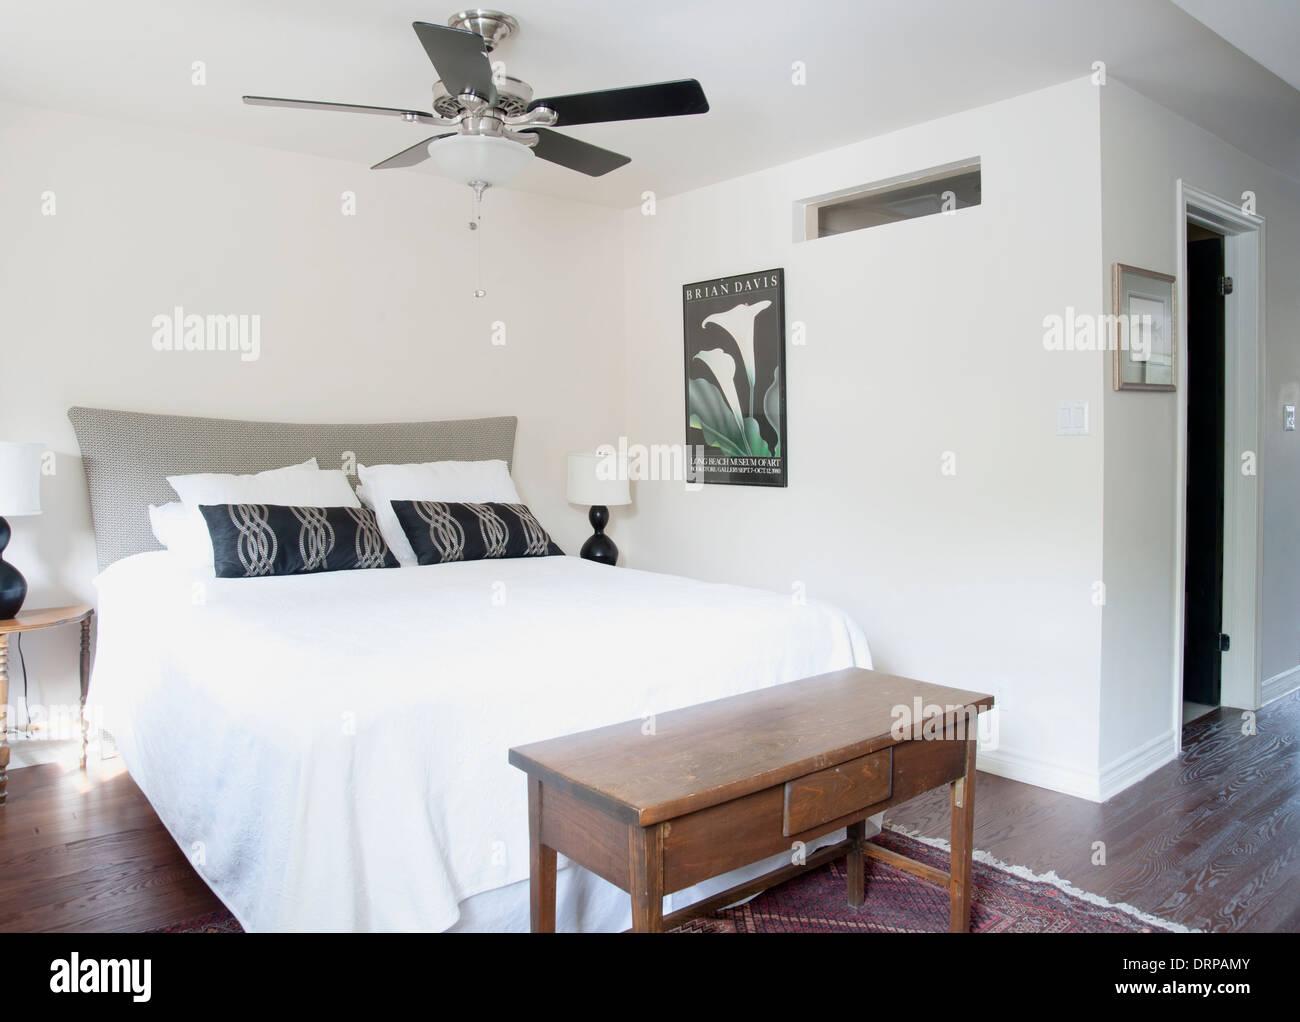 Habitacion en piso apartamento moderno con concepto abierto Imagen De Stock